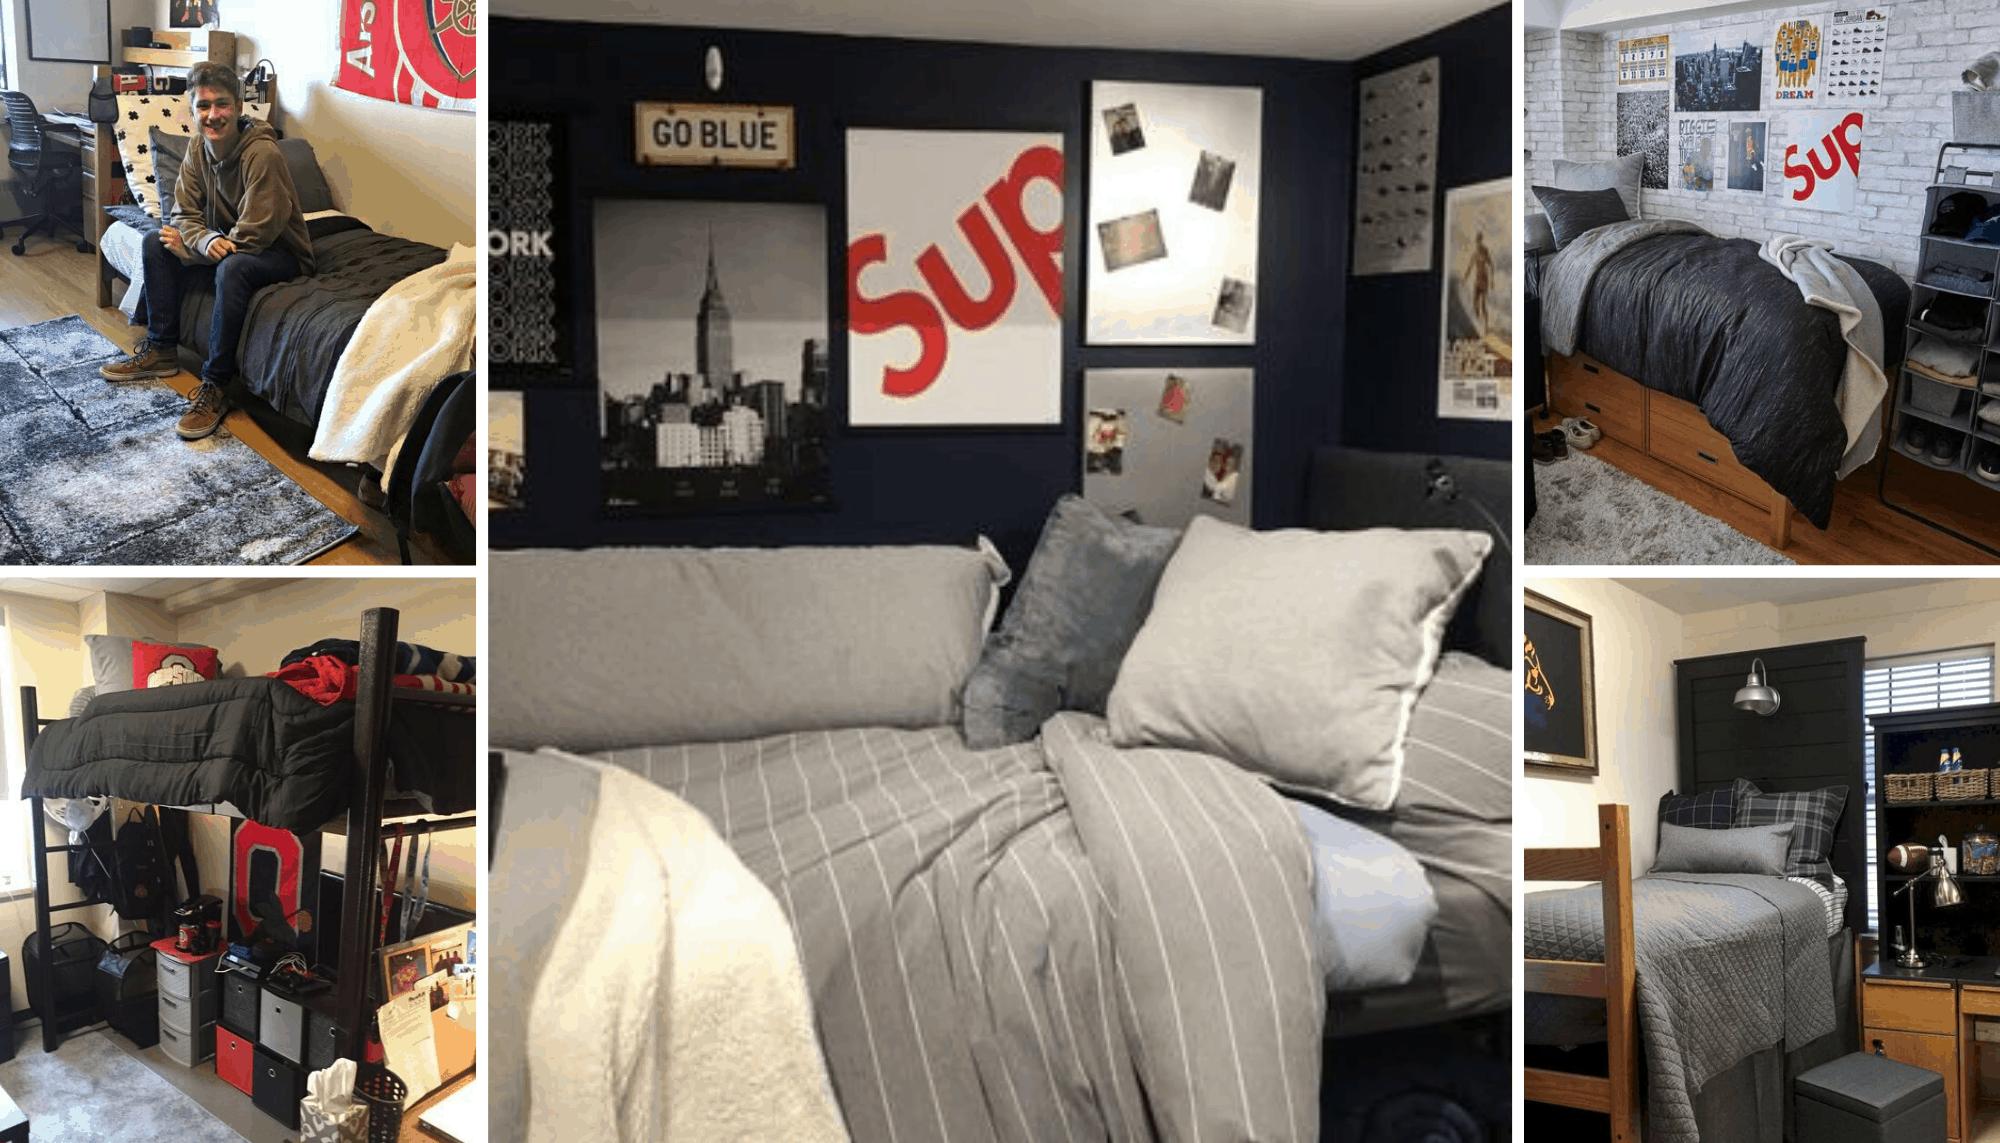 Dorm Room Ideas For Guys  12 Ideas For Guys Dorm Rooms That Aren